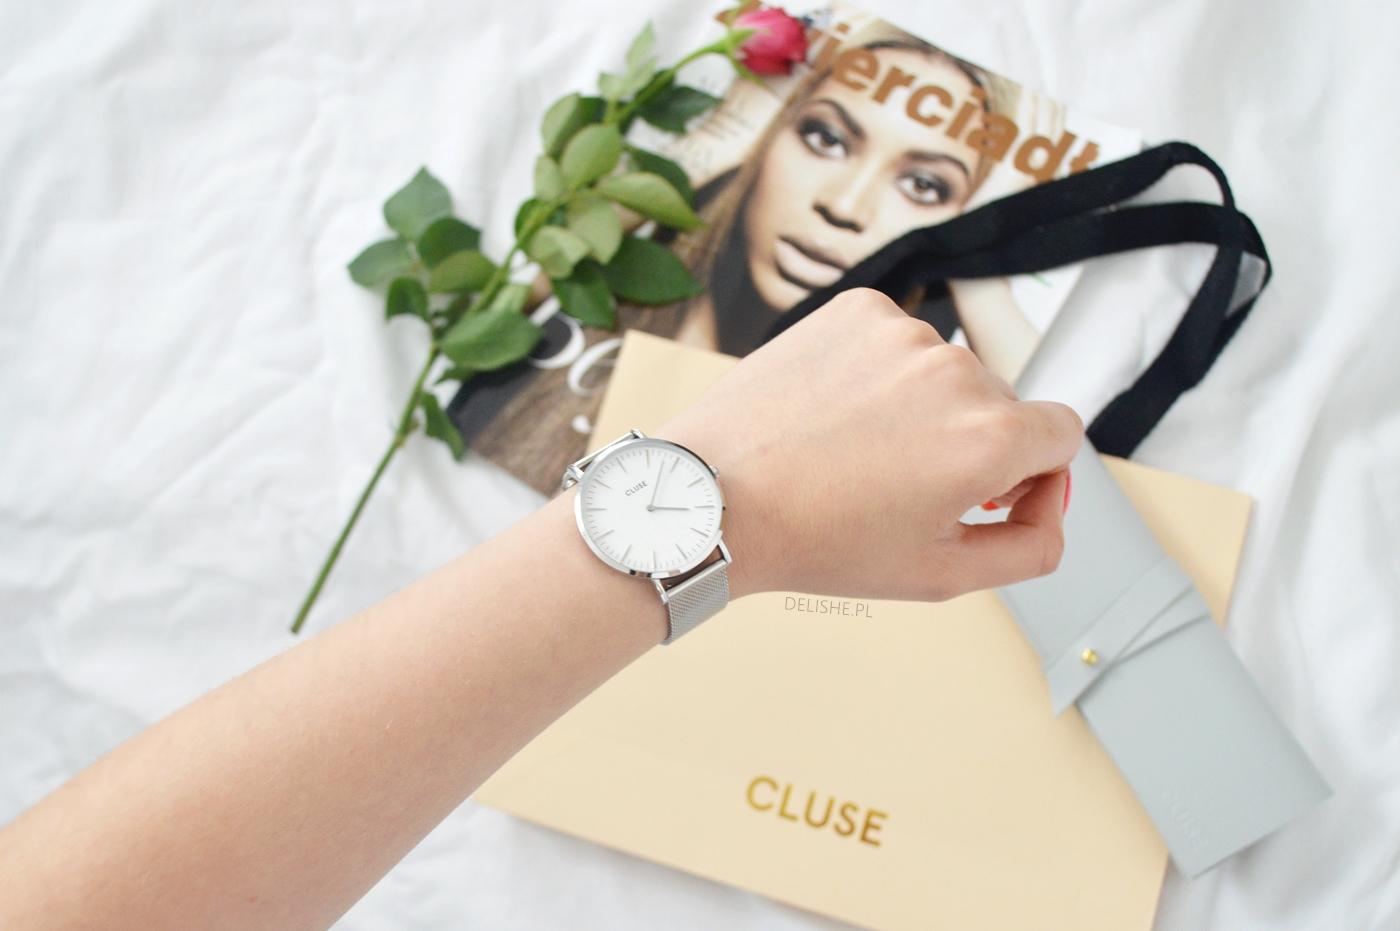 zegarek cluse srebrny na bransolecie